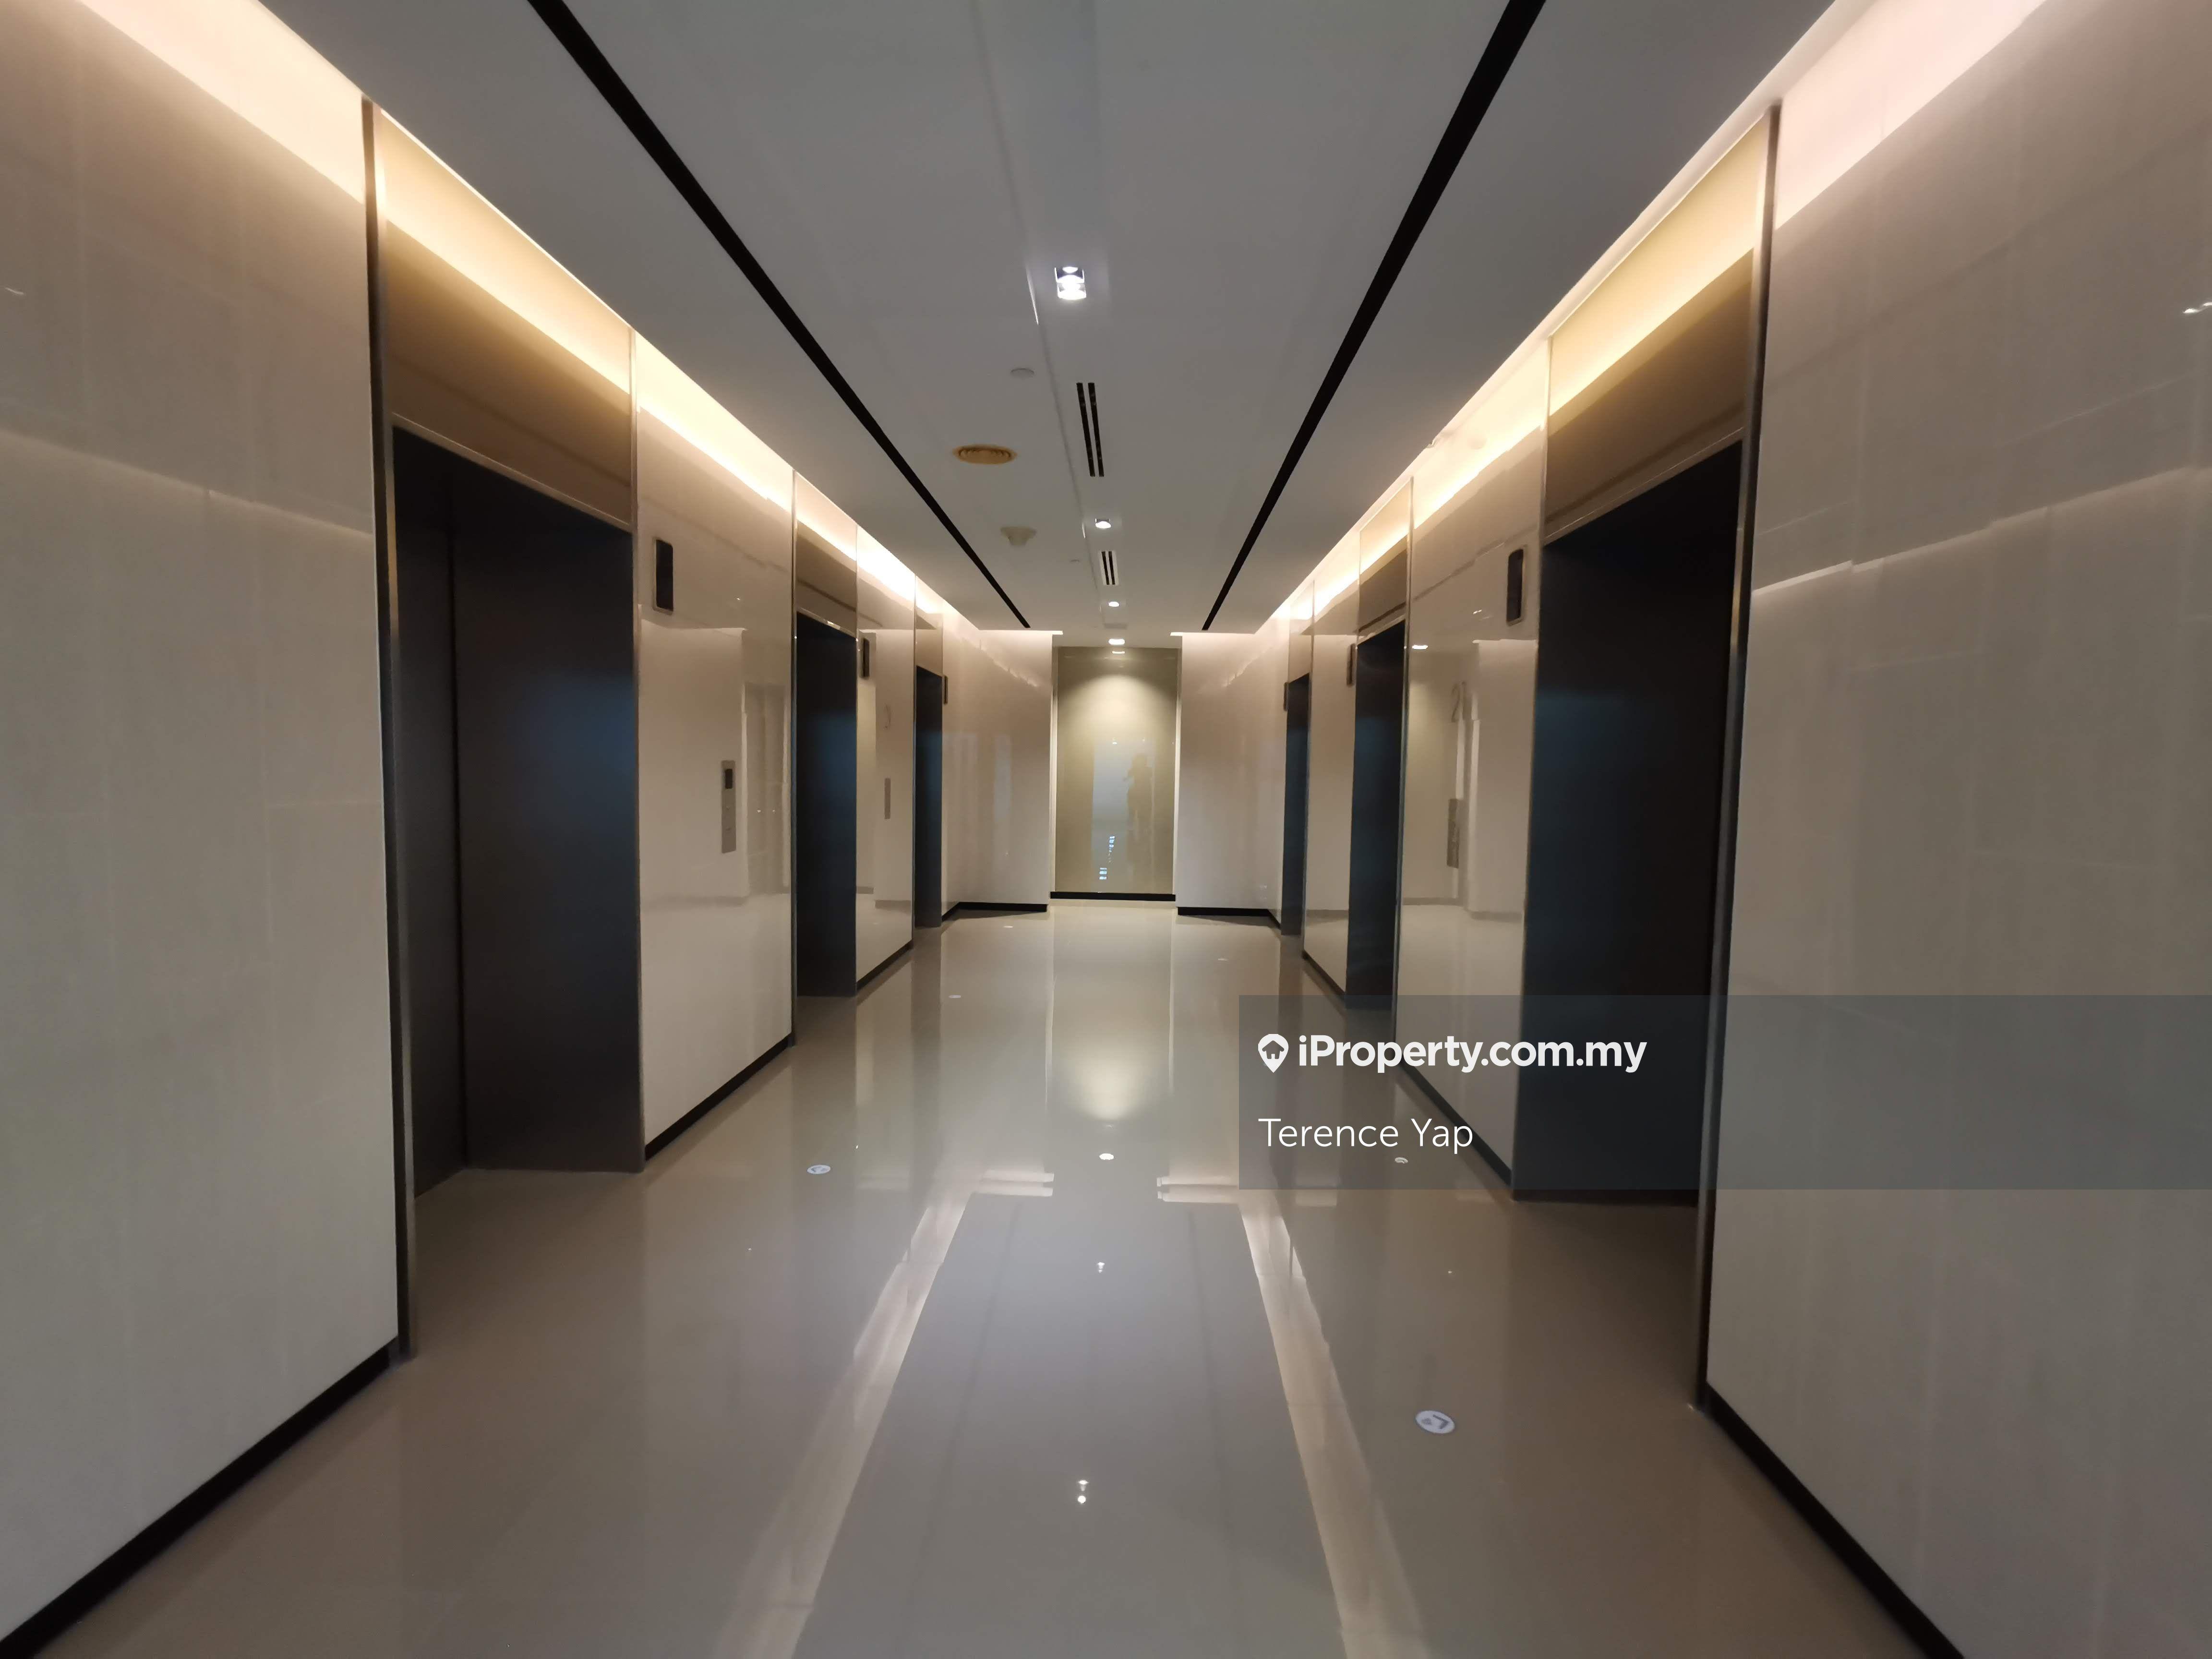 MENARA AIA SENTRAL, Menara AIA Sentral Bukit Bintang Sultan Ismail, Bukit Bintang